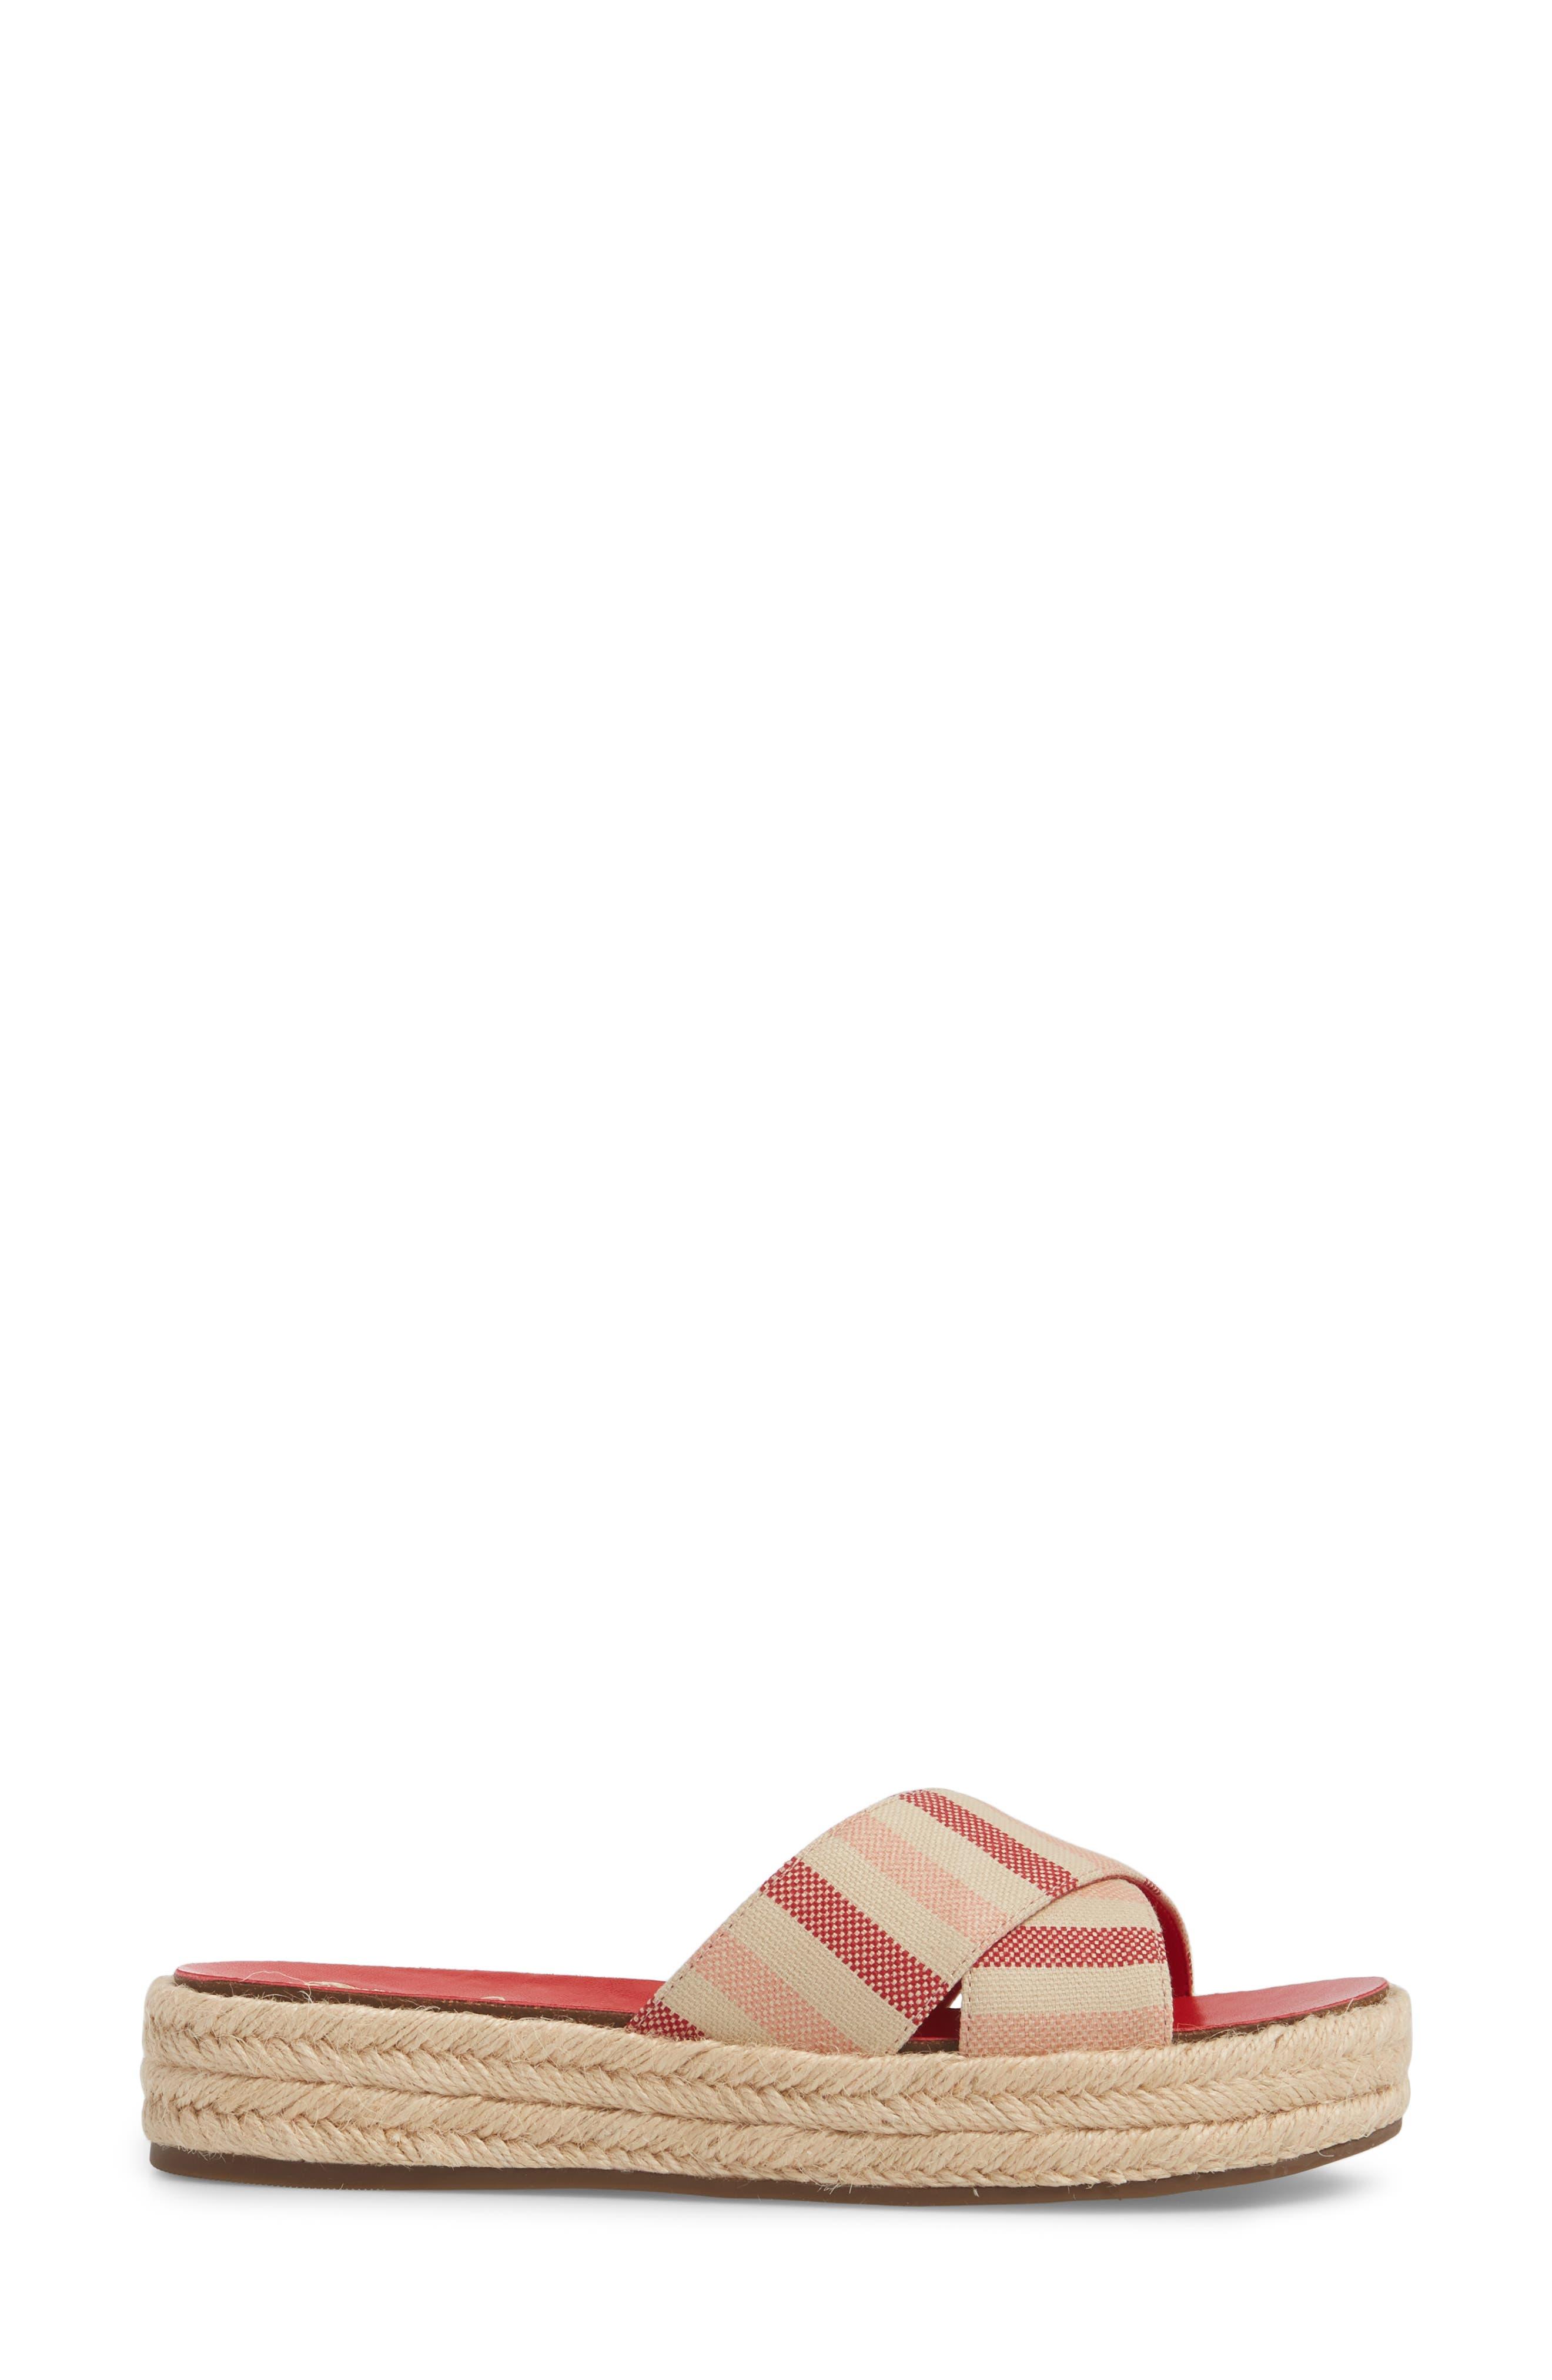 Carran Platform Sandal,                             Alternate thumbnail 20, color,